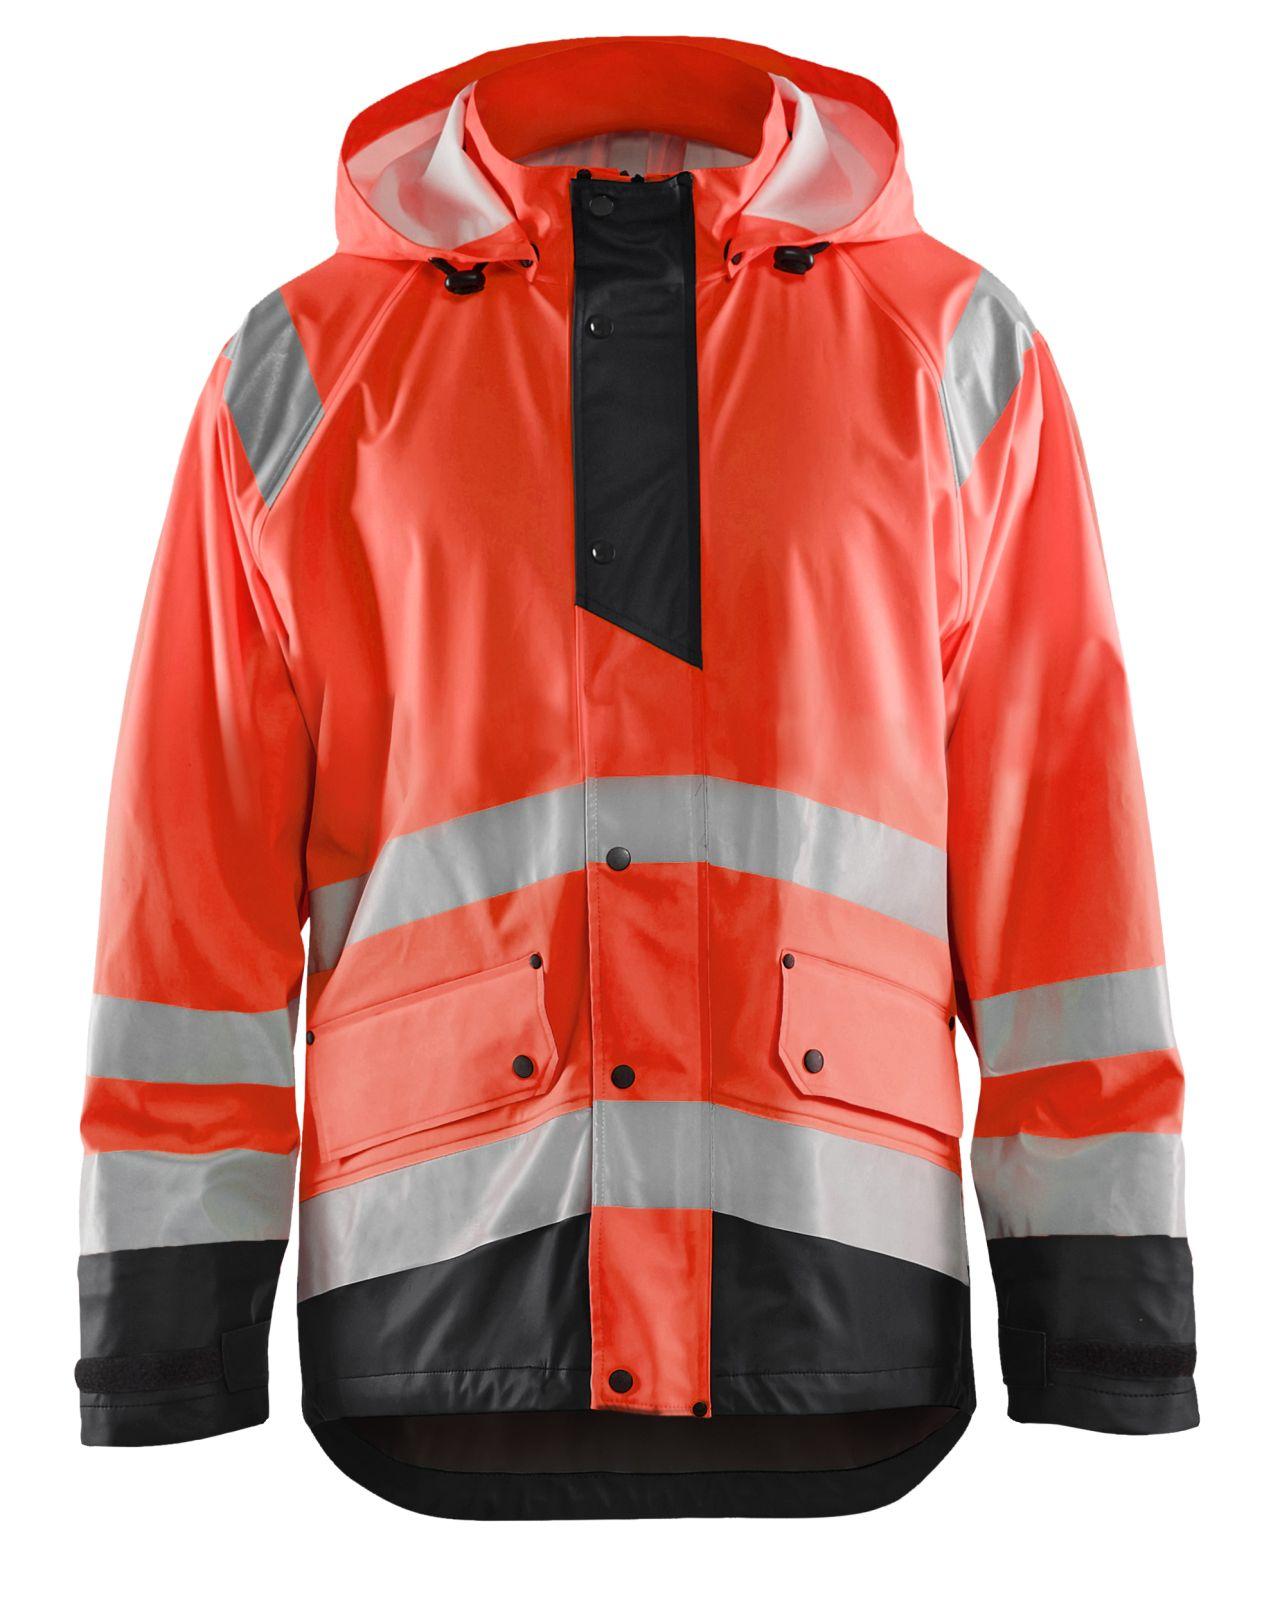 Blaklader Regenjassen 43232000 High Vis fluo rood-zwart(5599)